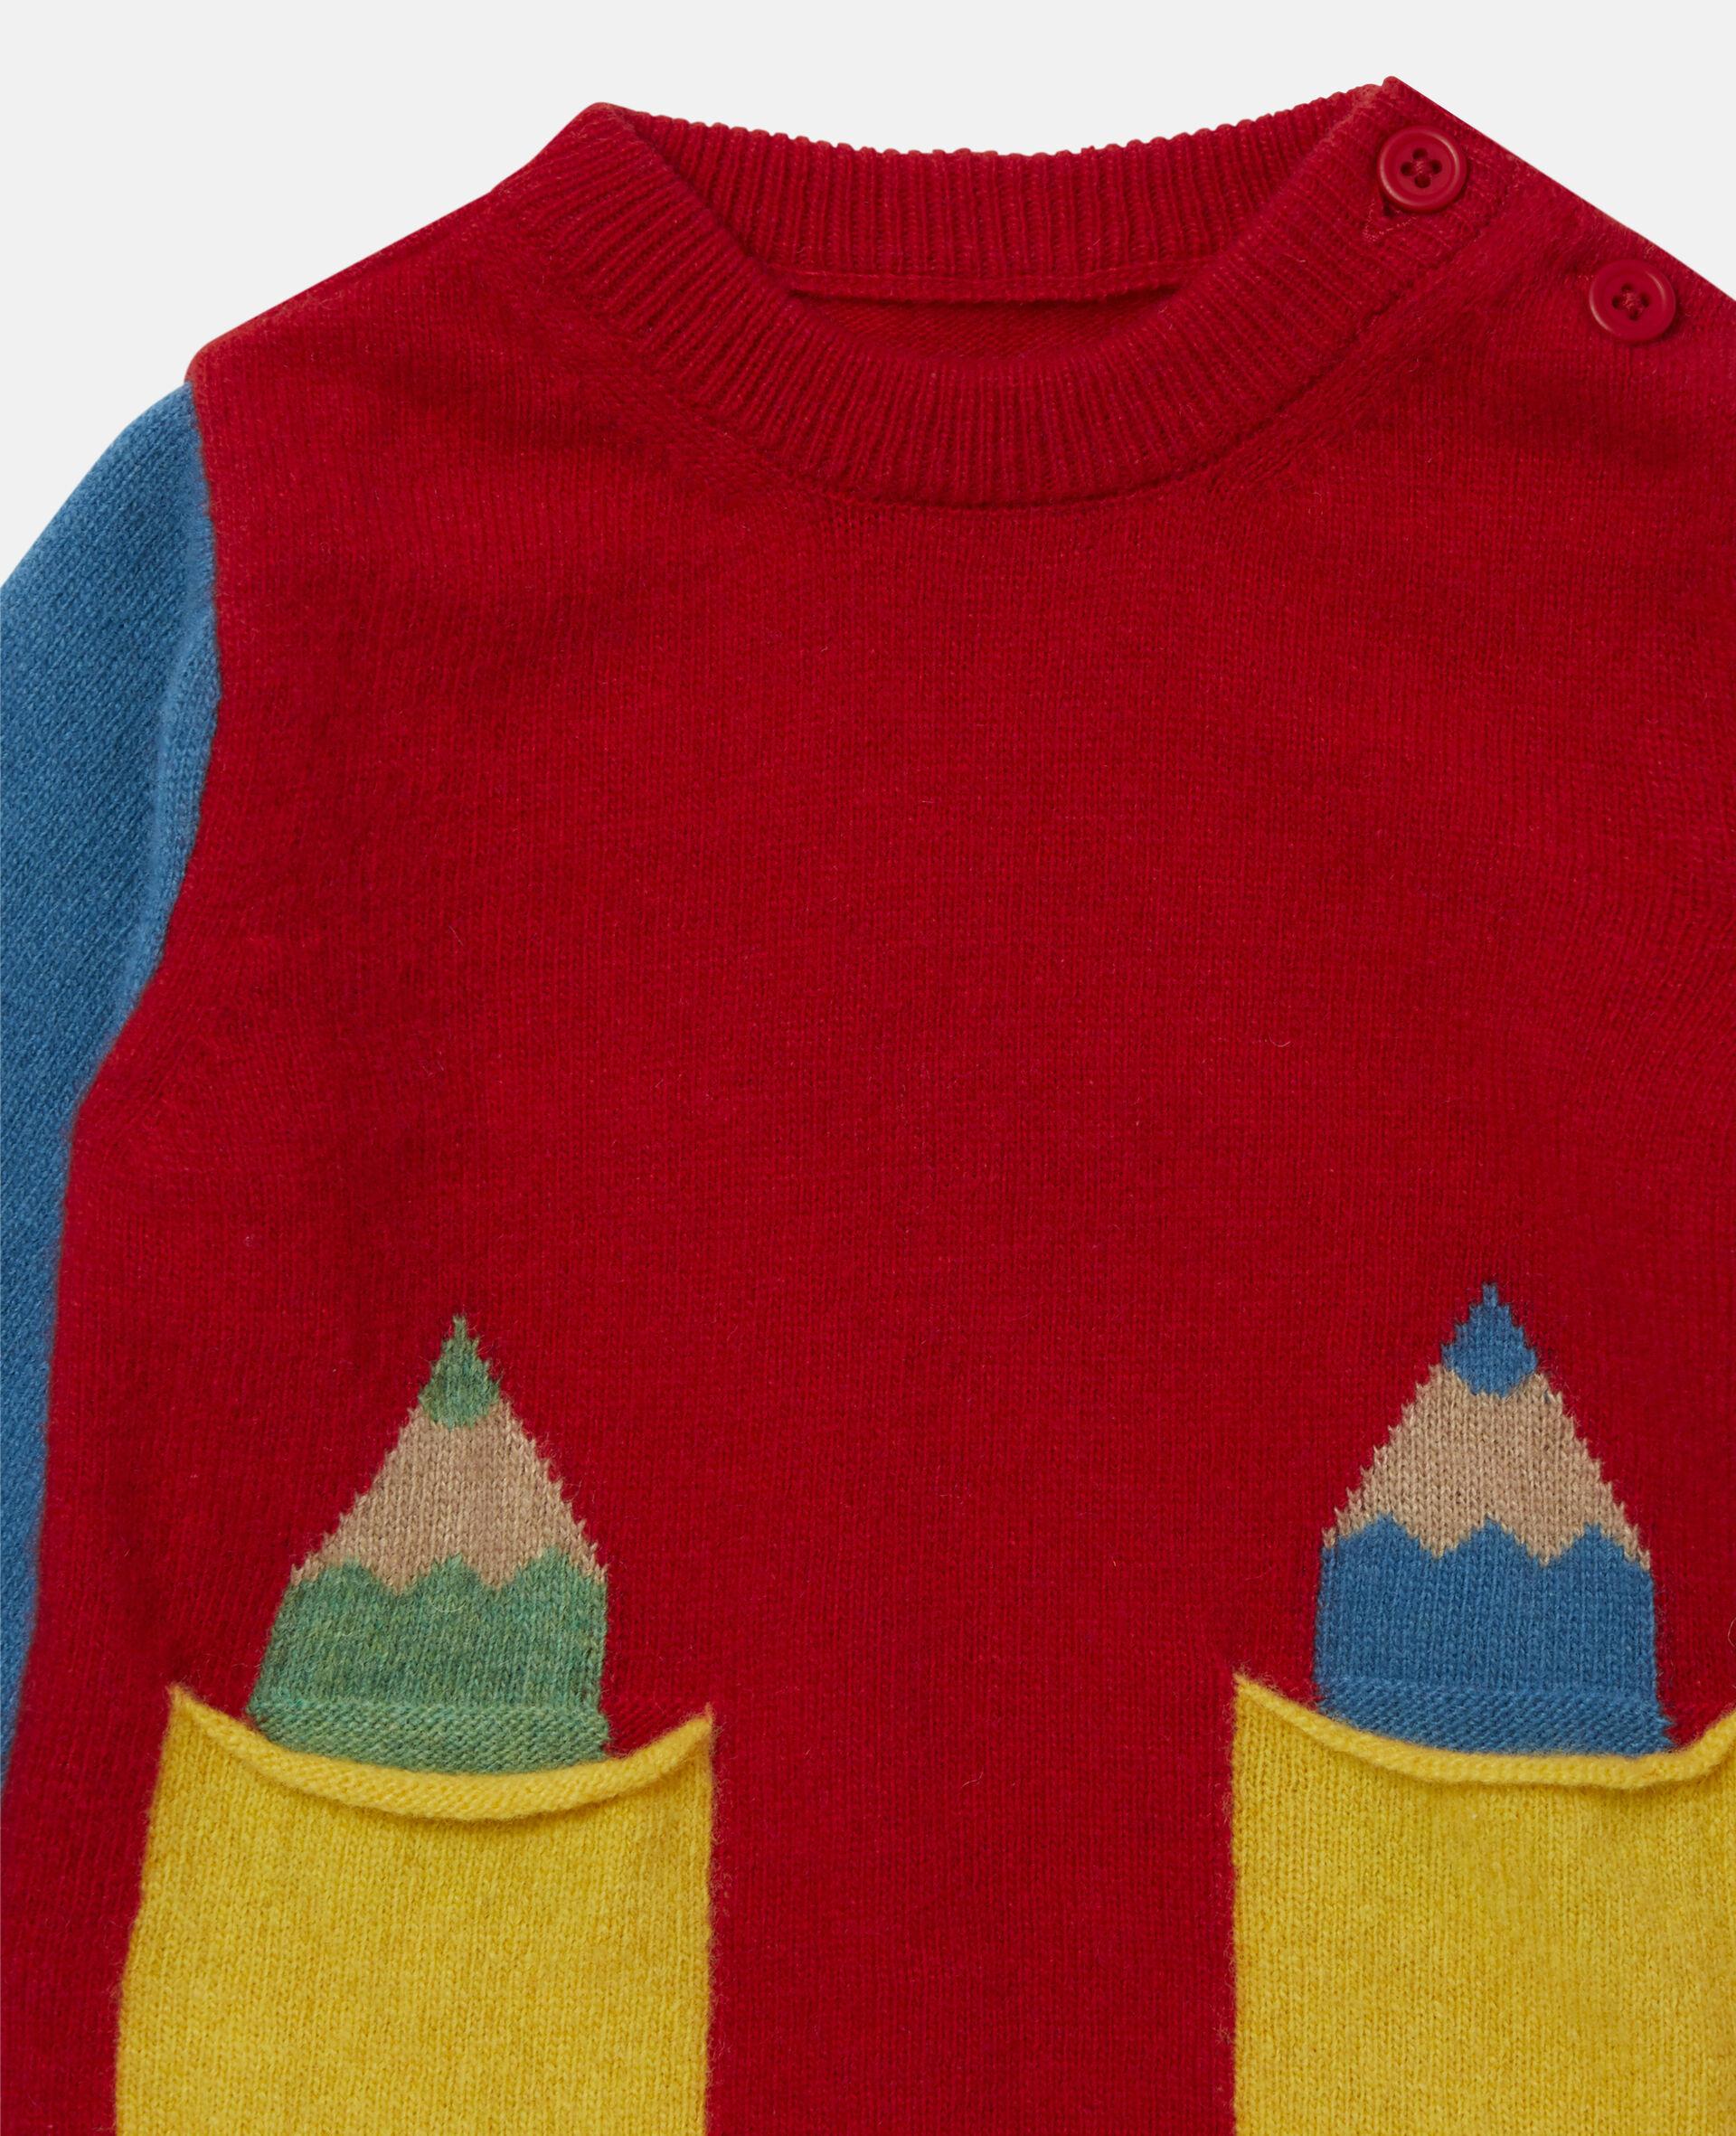 Strickpullover in Blockfarben-Design mit Intarsienmuster-Bunt-large image number 1